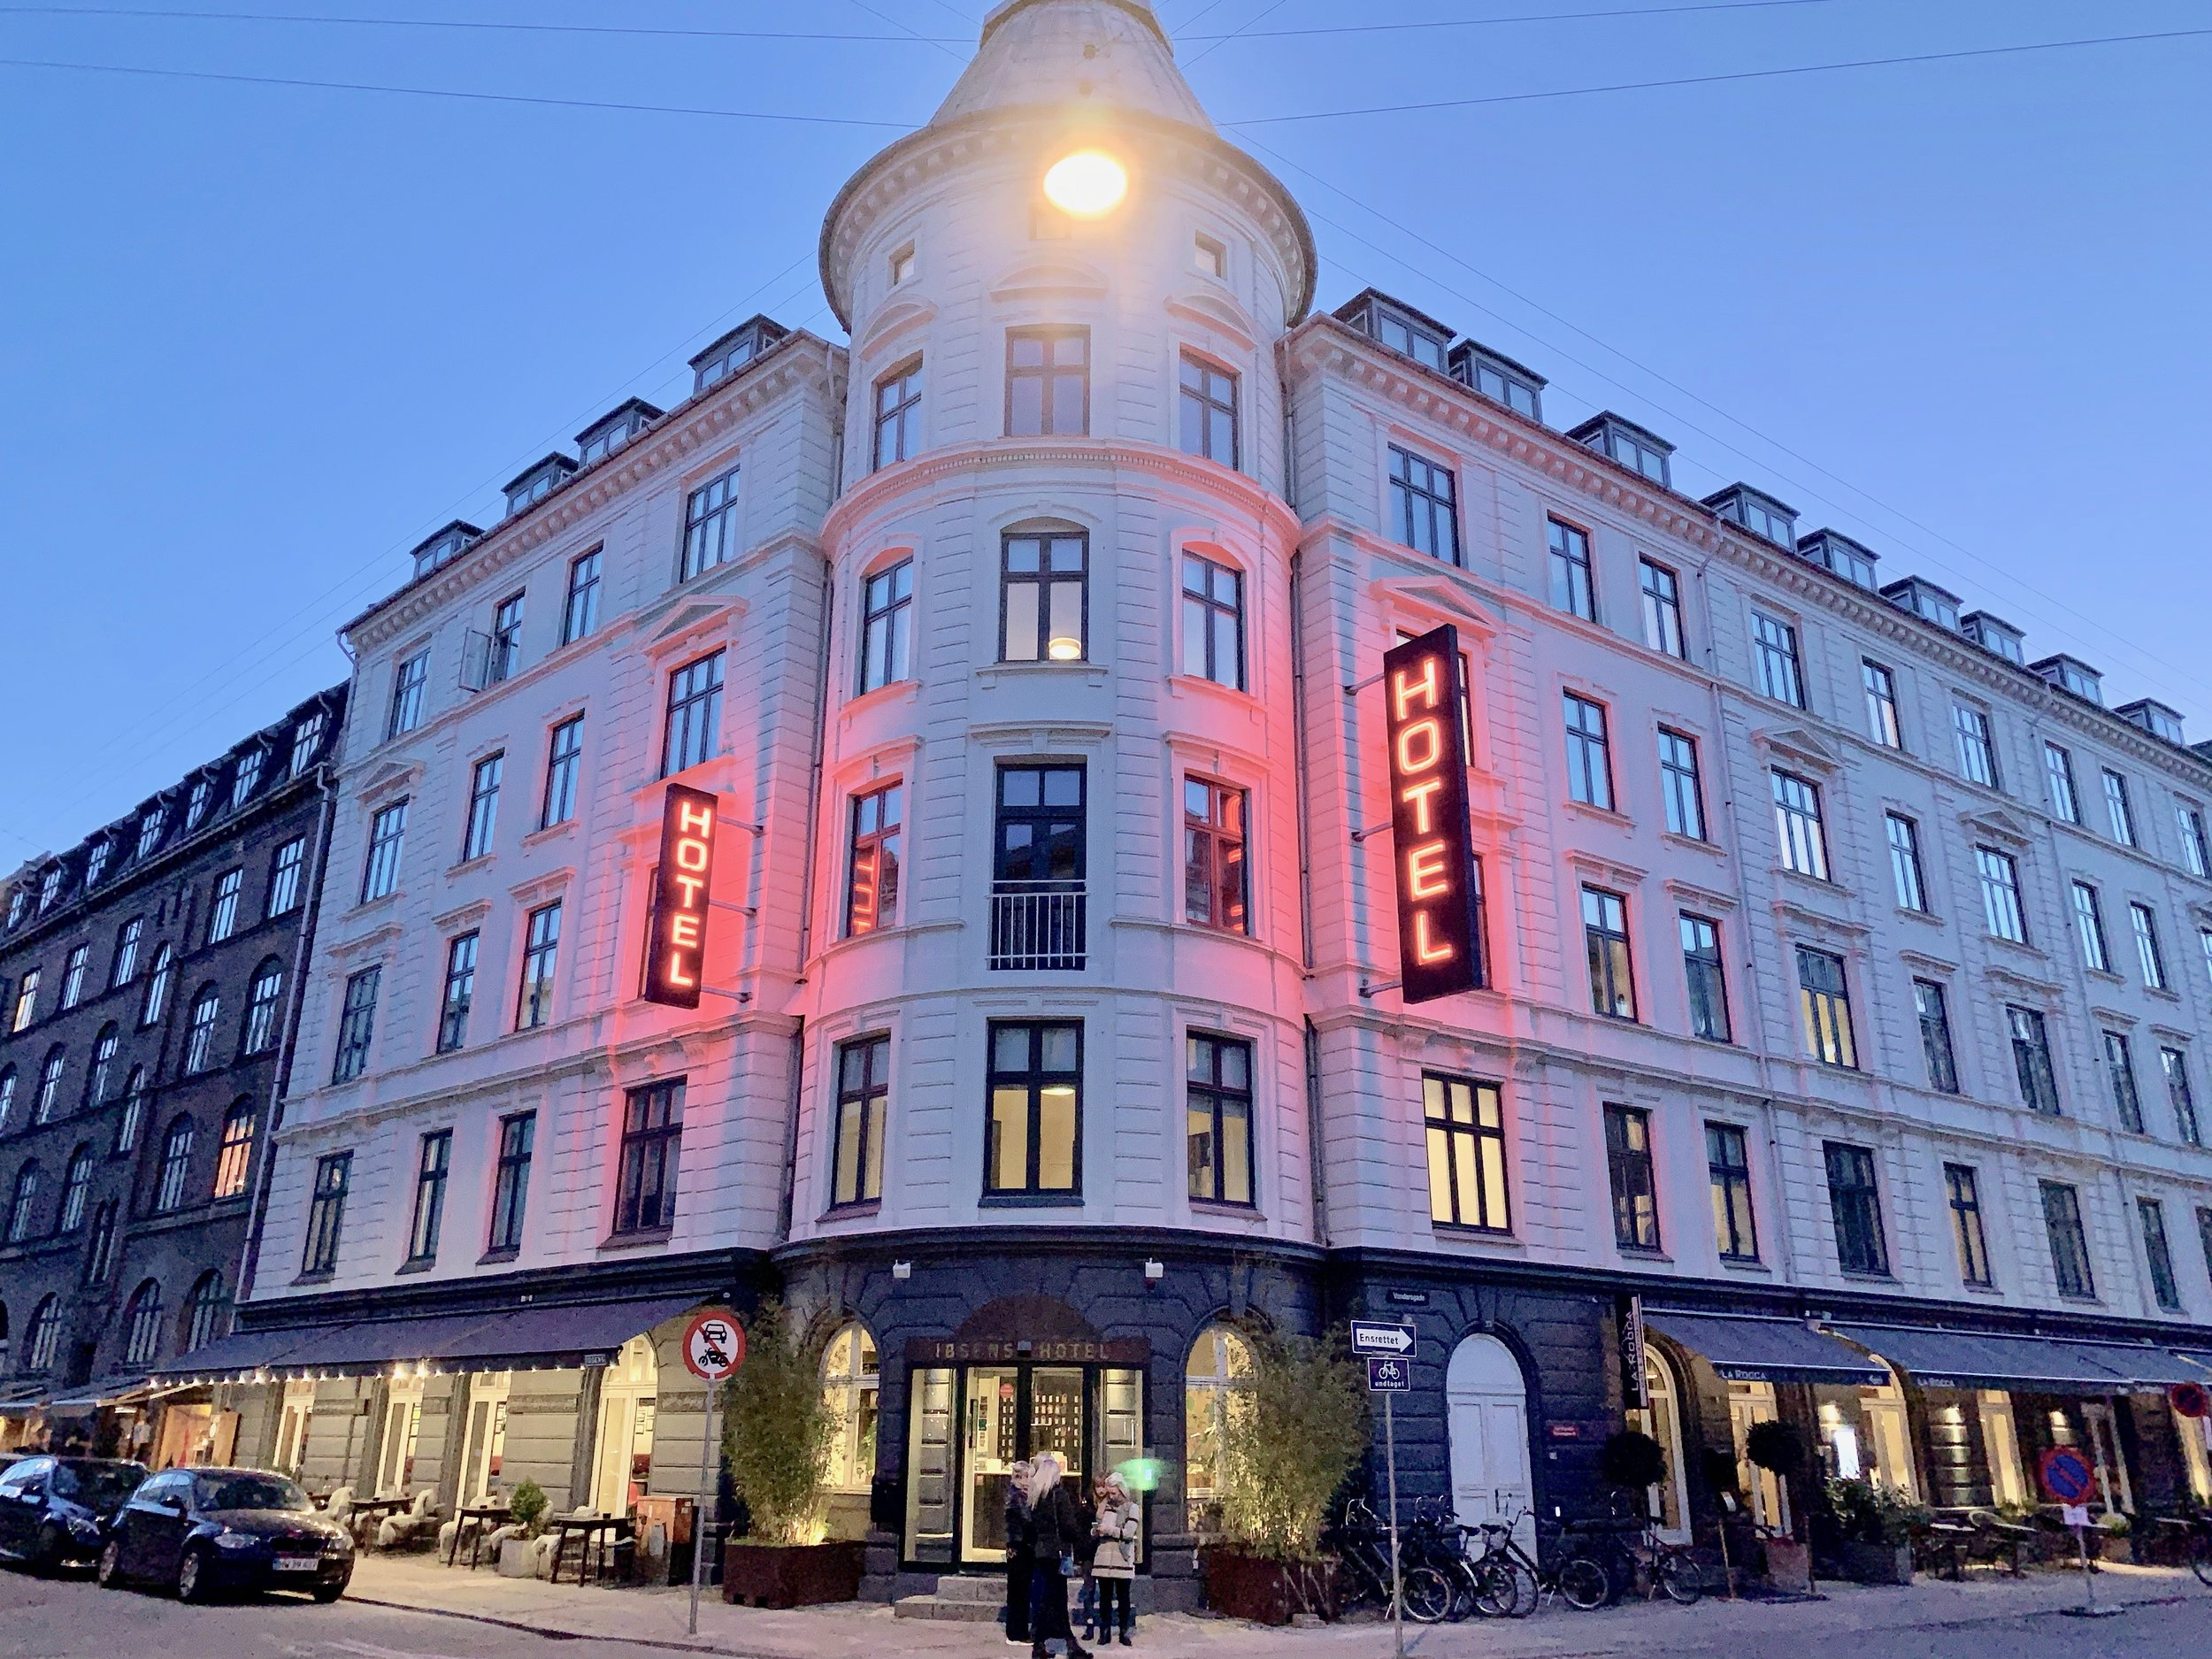 Ibsen Hotel ligger i Vendersgade 23. Foto: Odd Roar Lange